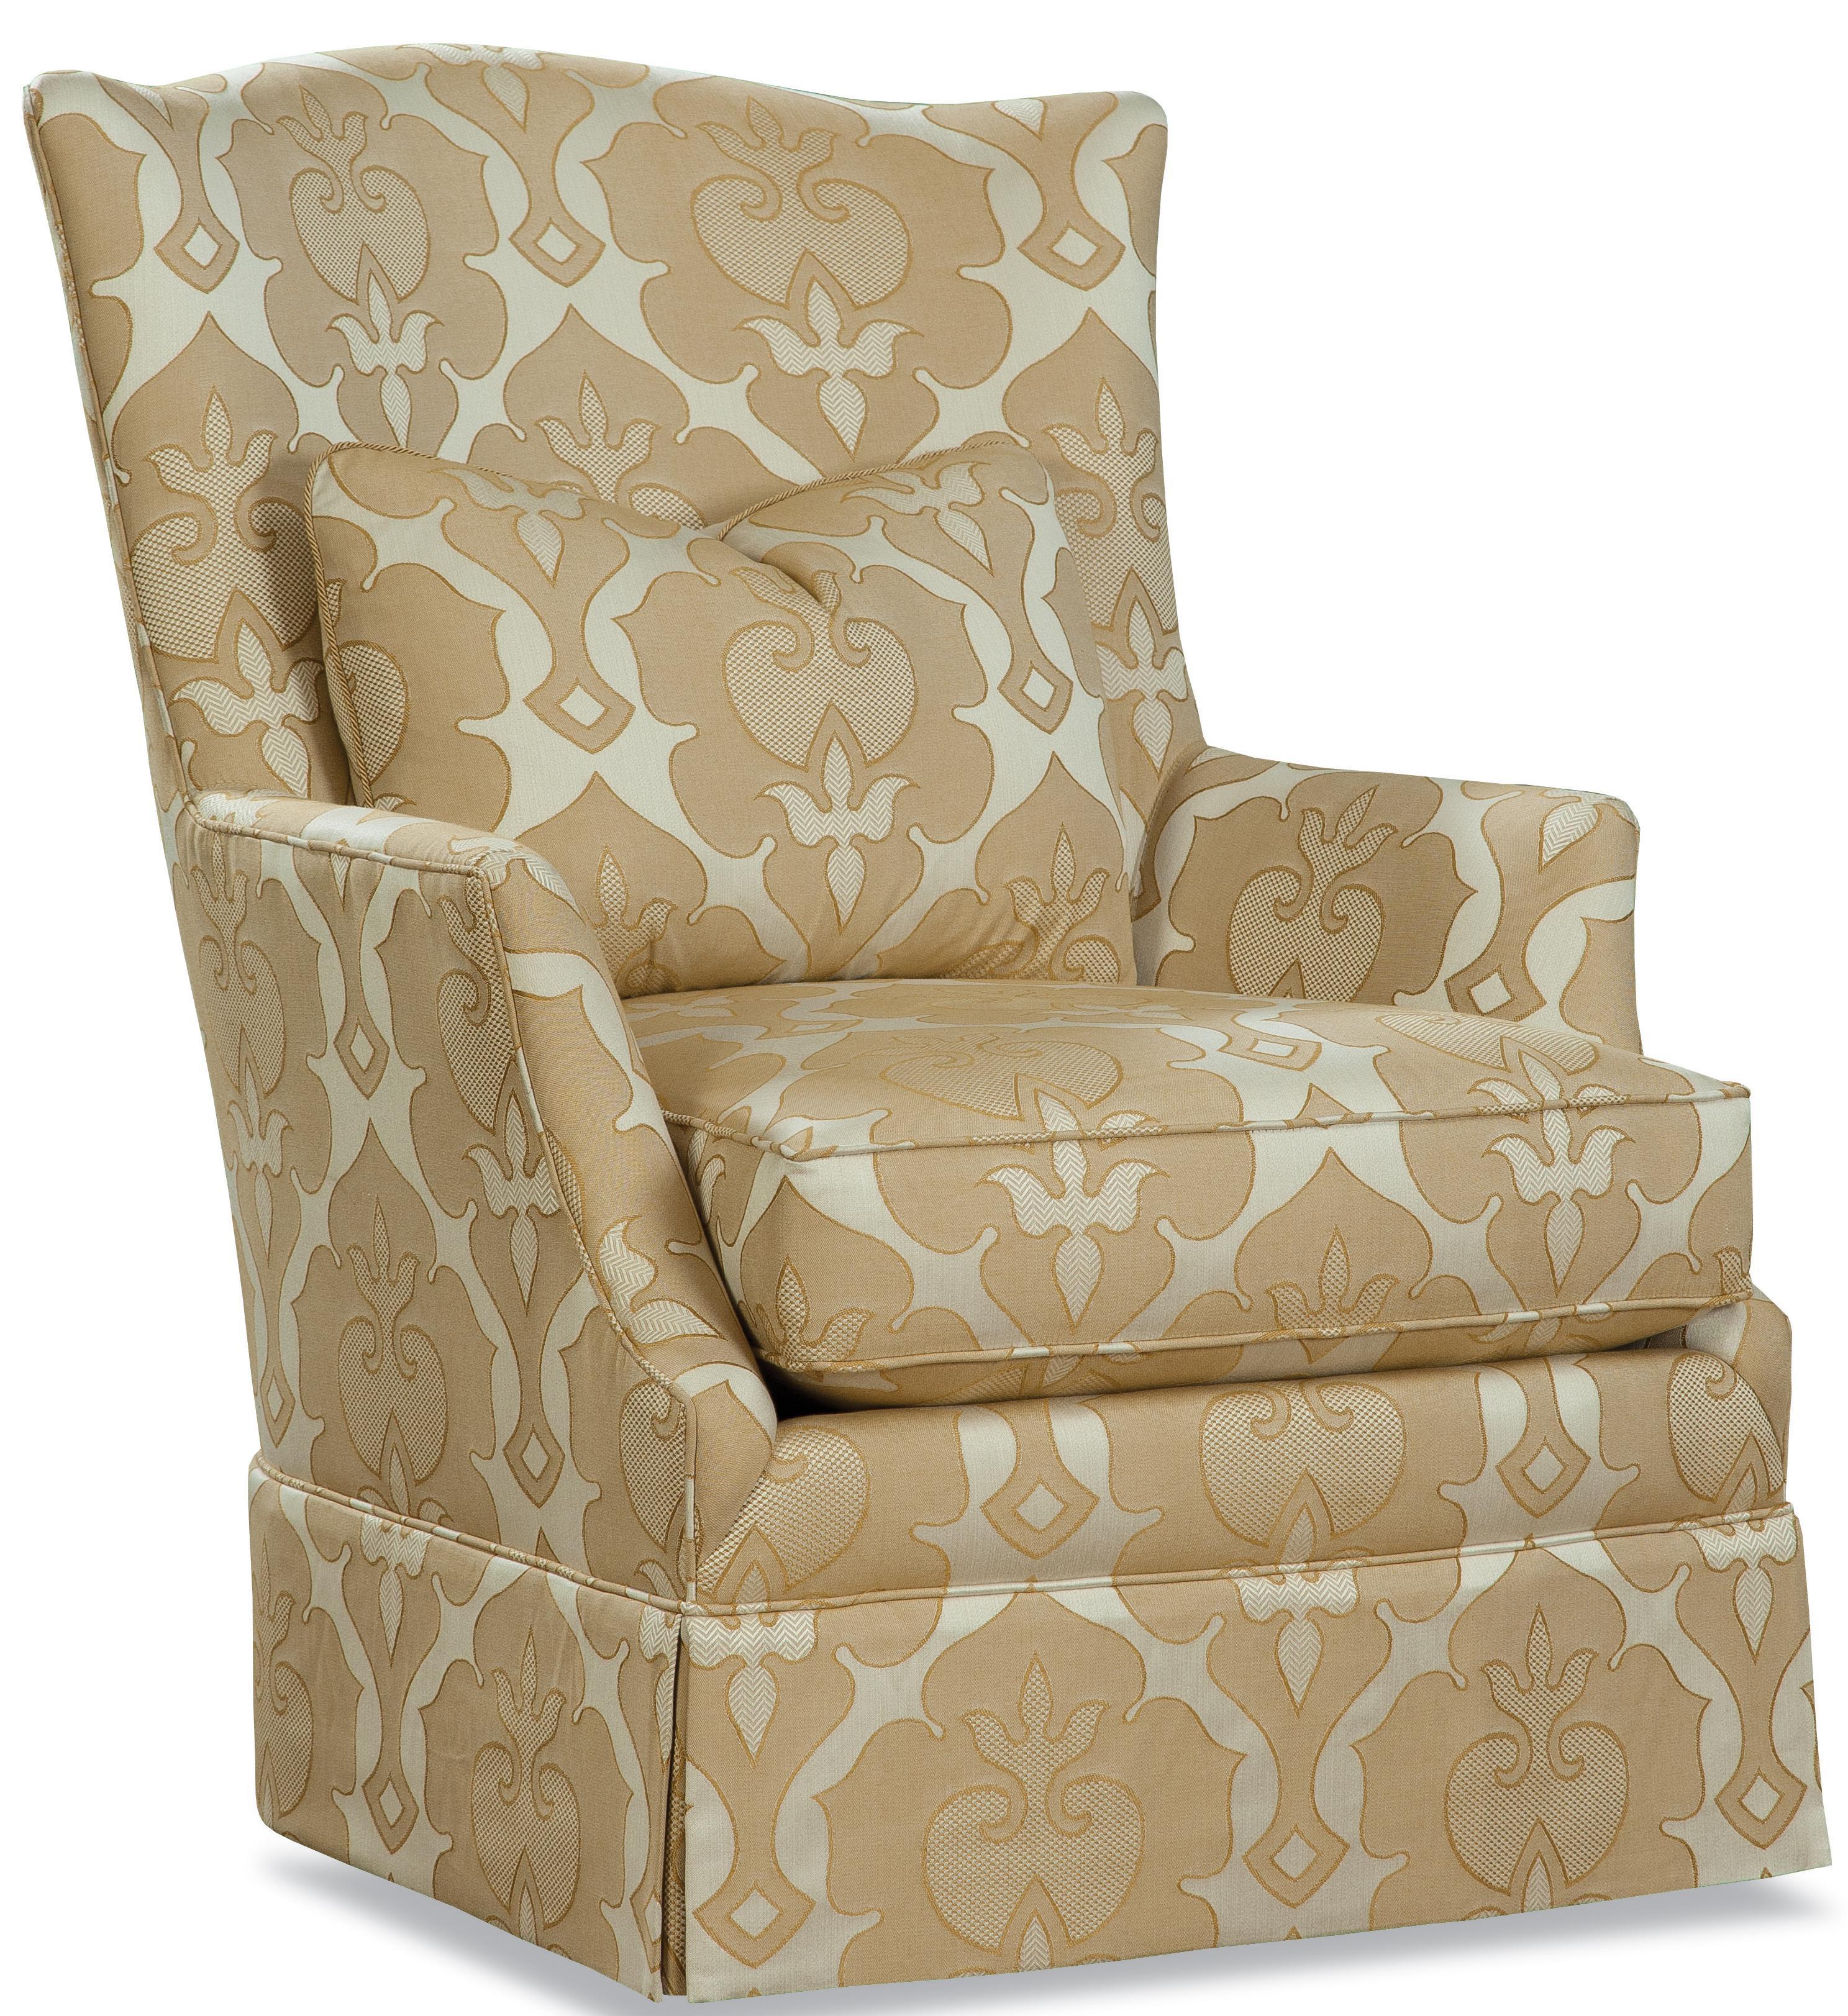 3368 Upholstered Chair by Geoffrey Alexander at Sprintz Furniture